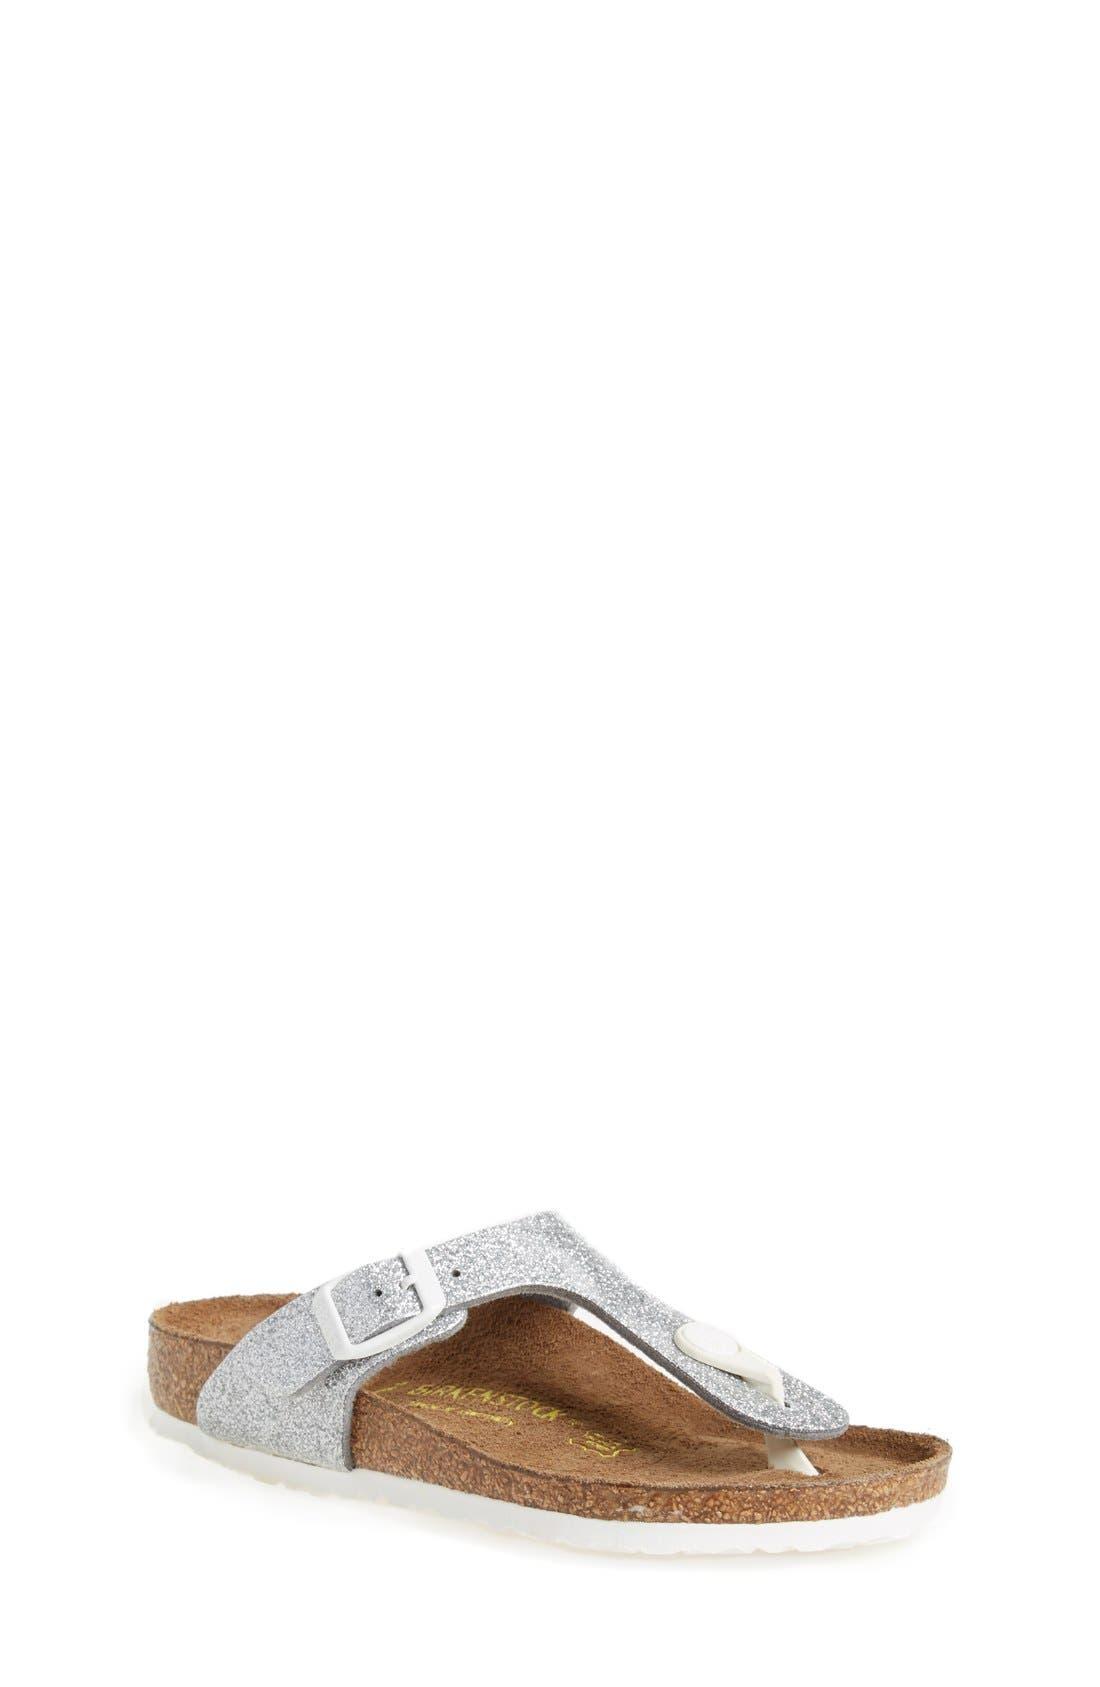 BIRKENSTOCK 'Gizeh Galaxy Birko-Flor' Thong Sandal